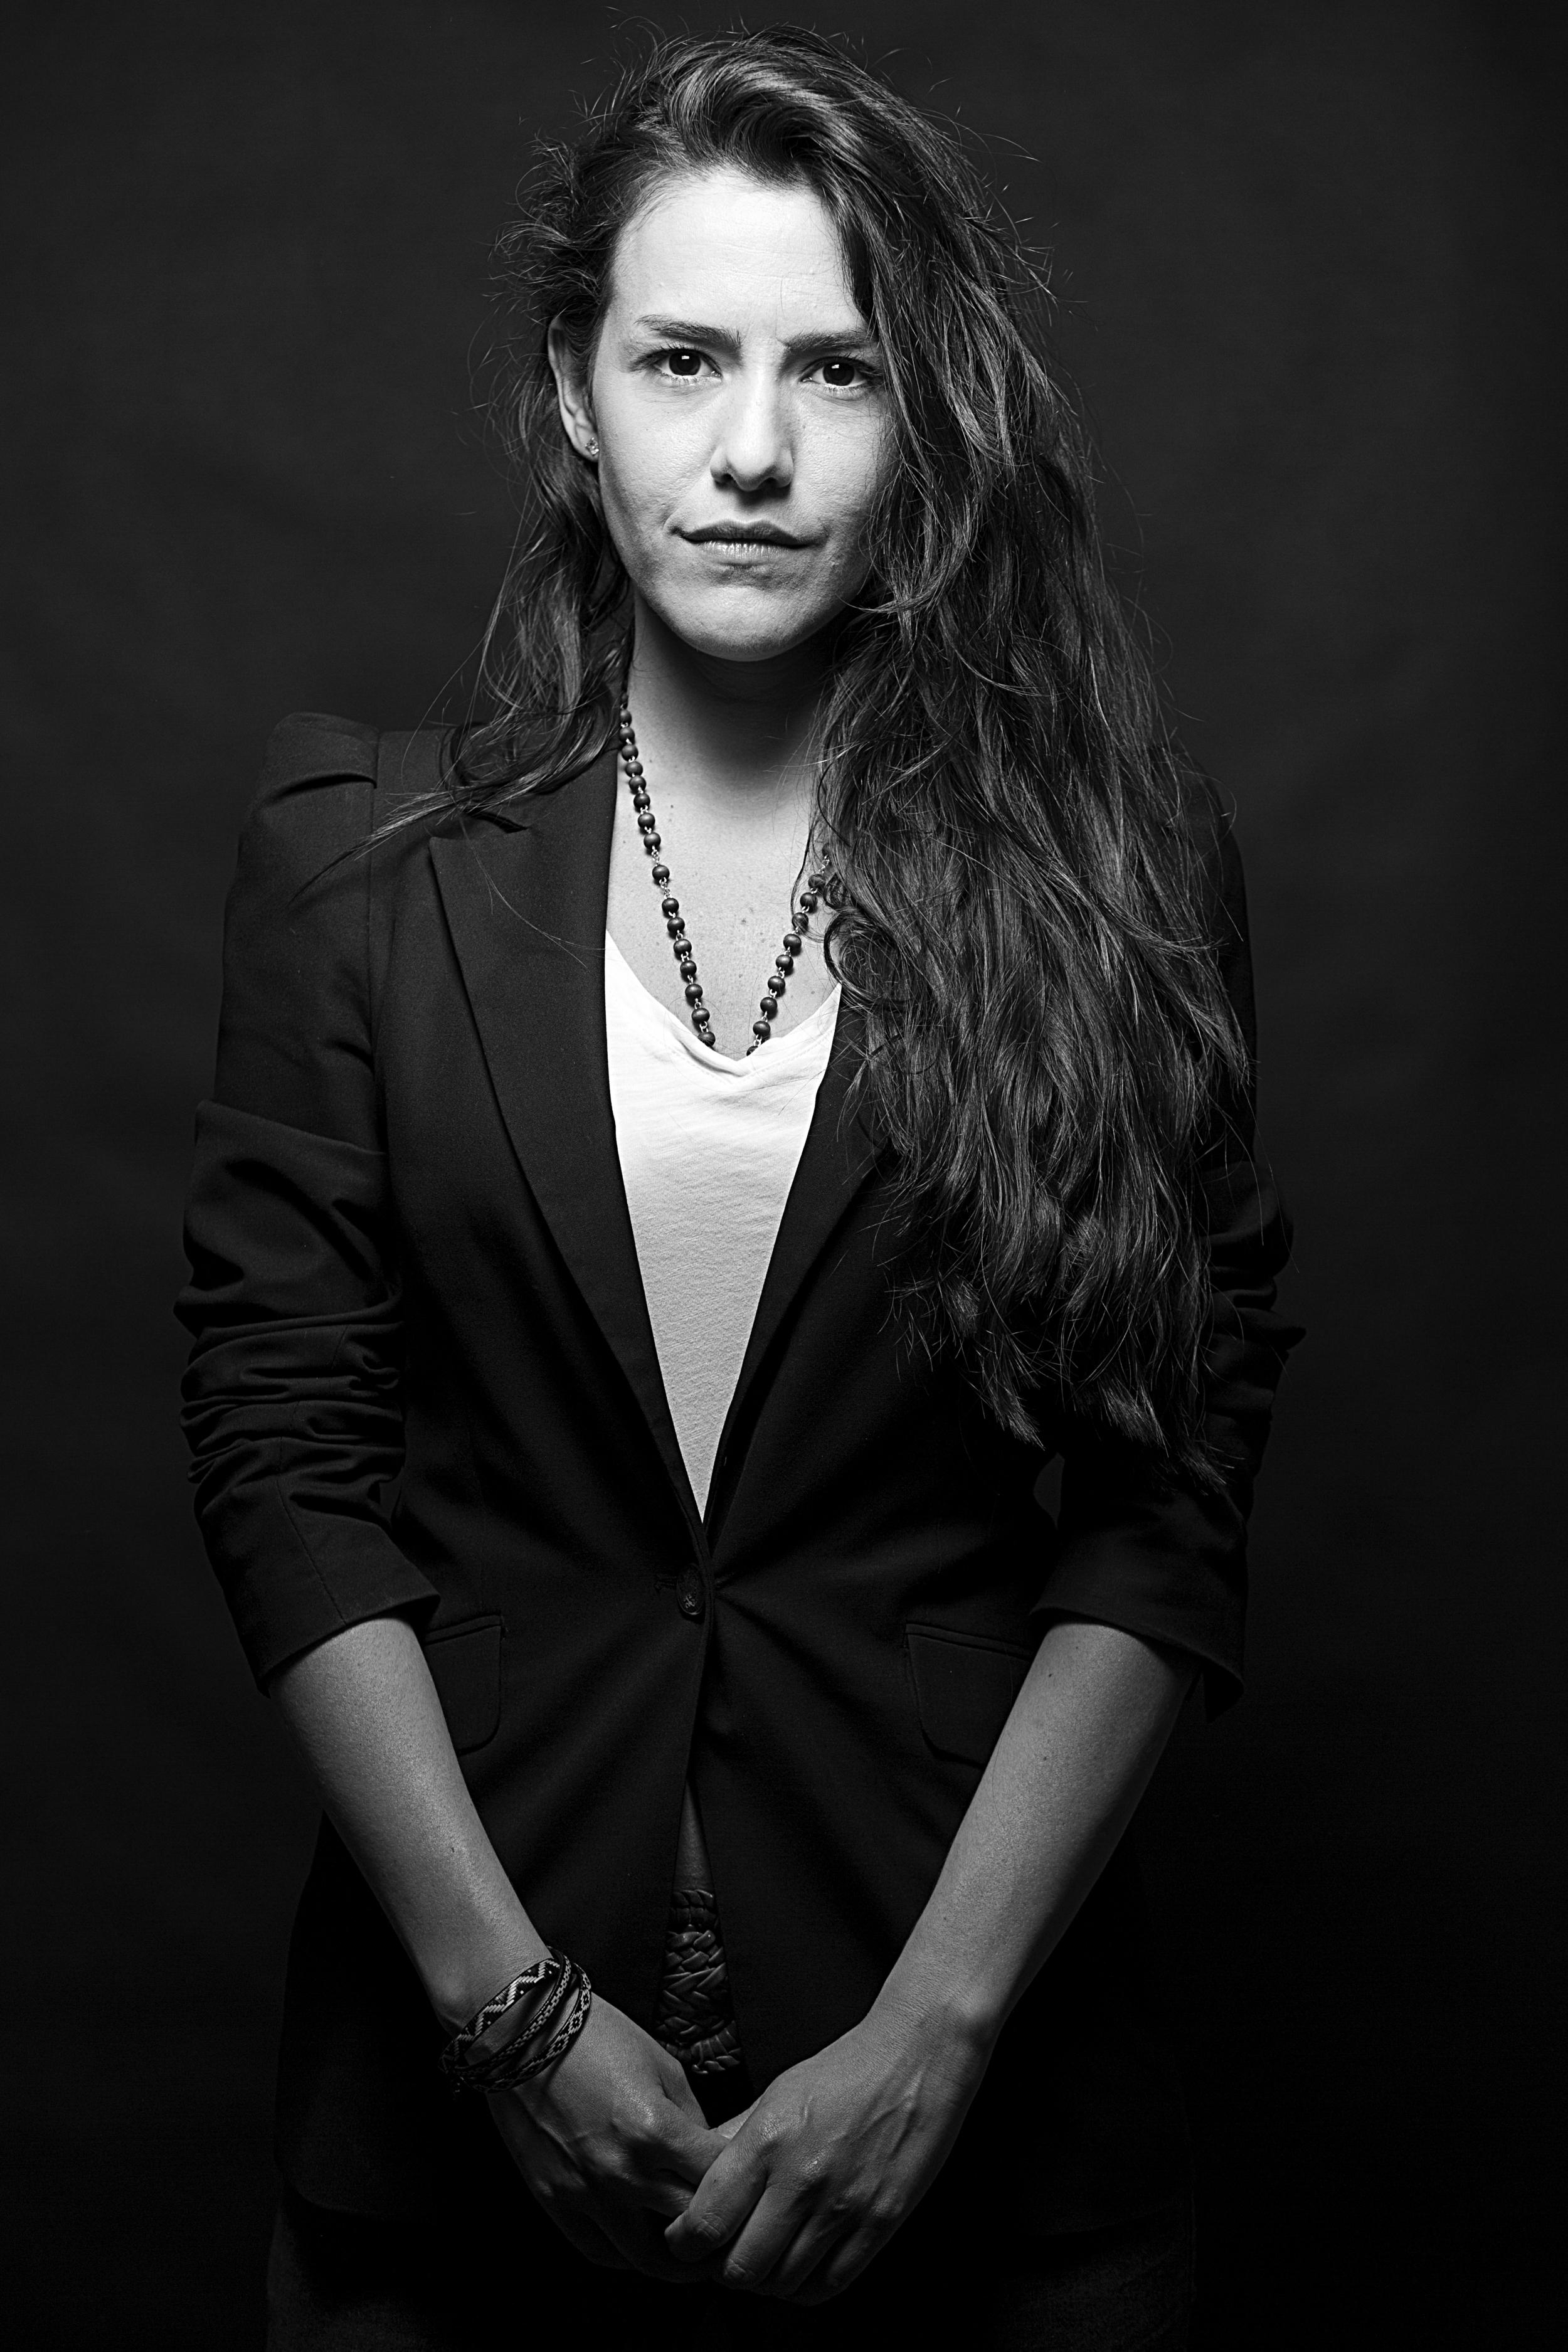 Johanna Vargas